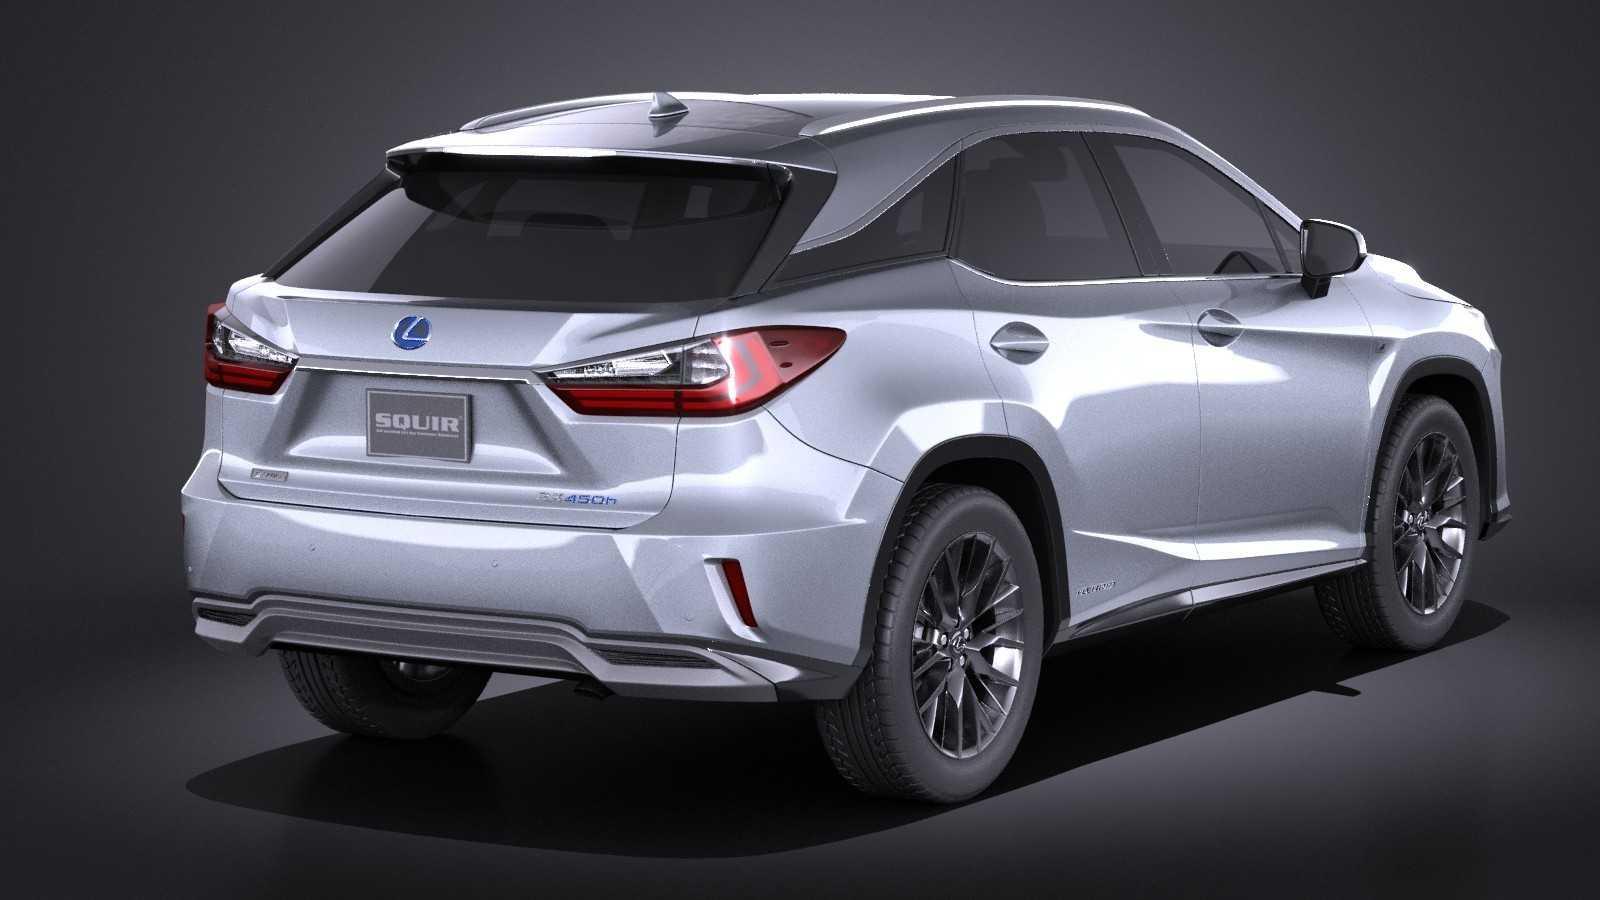 Lexus rx 450h 2018 гибрид: характеристики, фото, комплектации